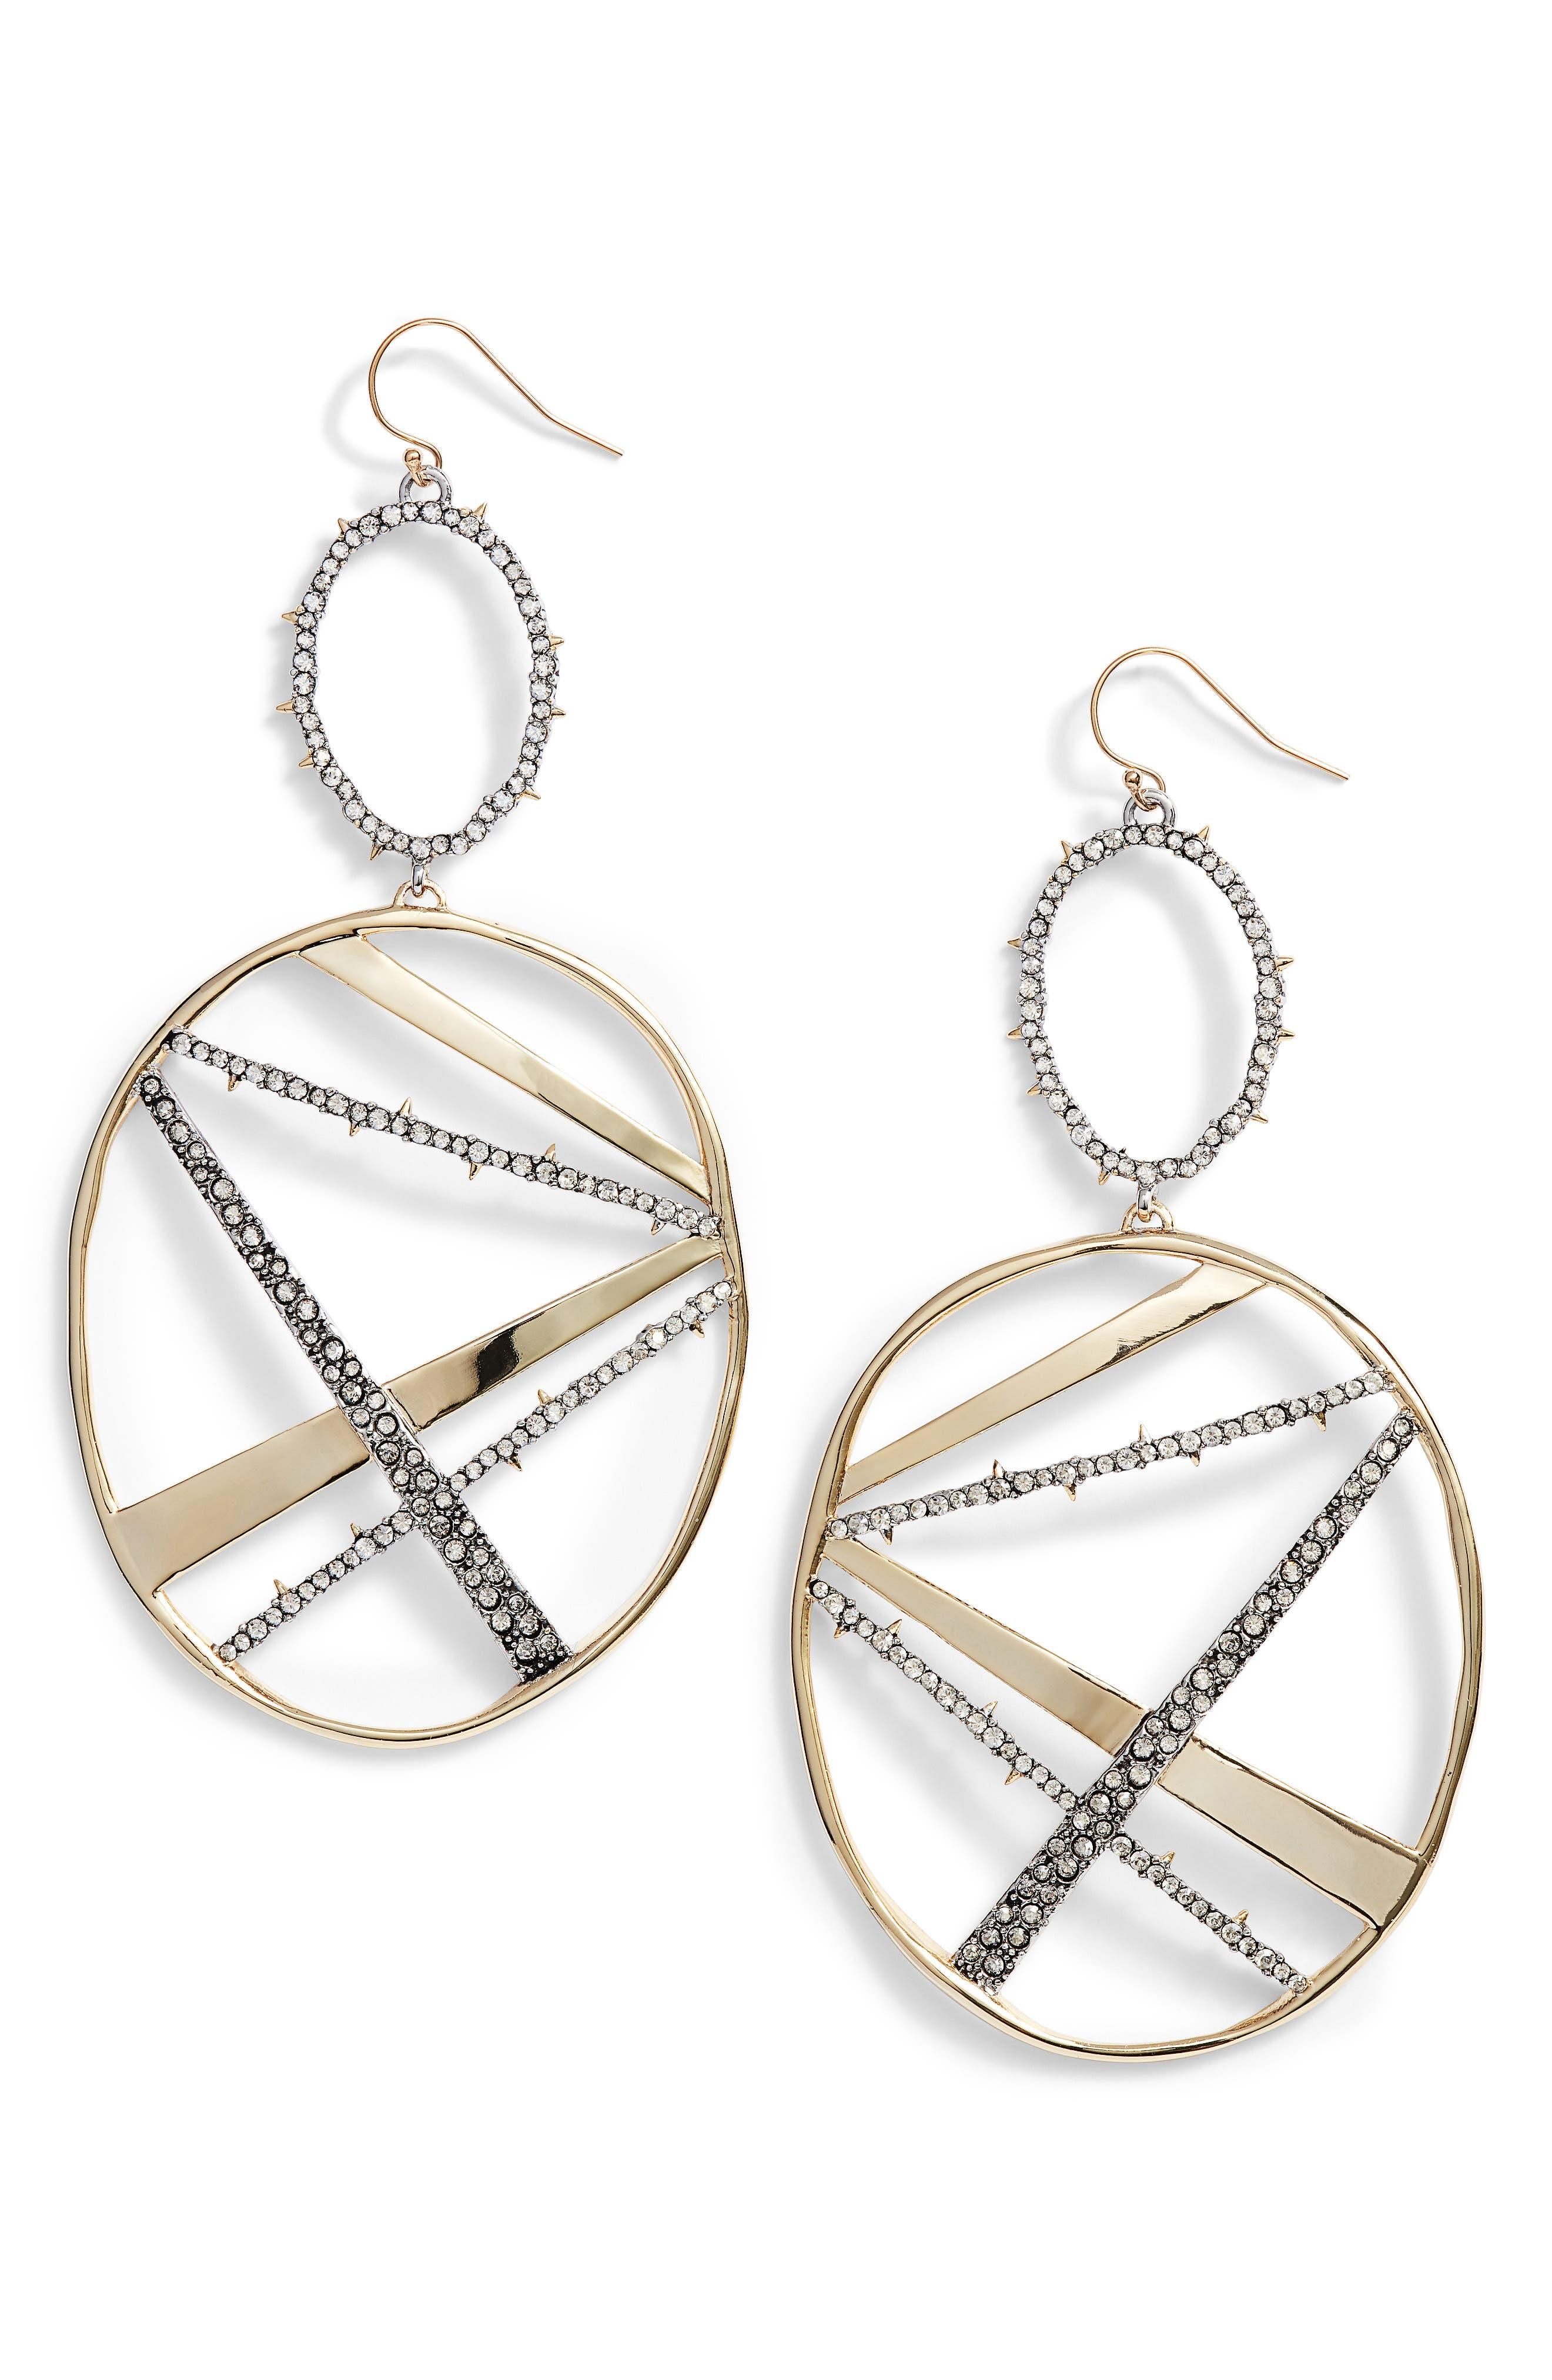 Oversize Dangling Hoop Earrings,                             Main thumbnail 1, color,                             Gold/ Silver